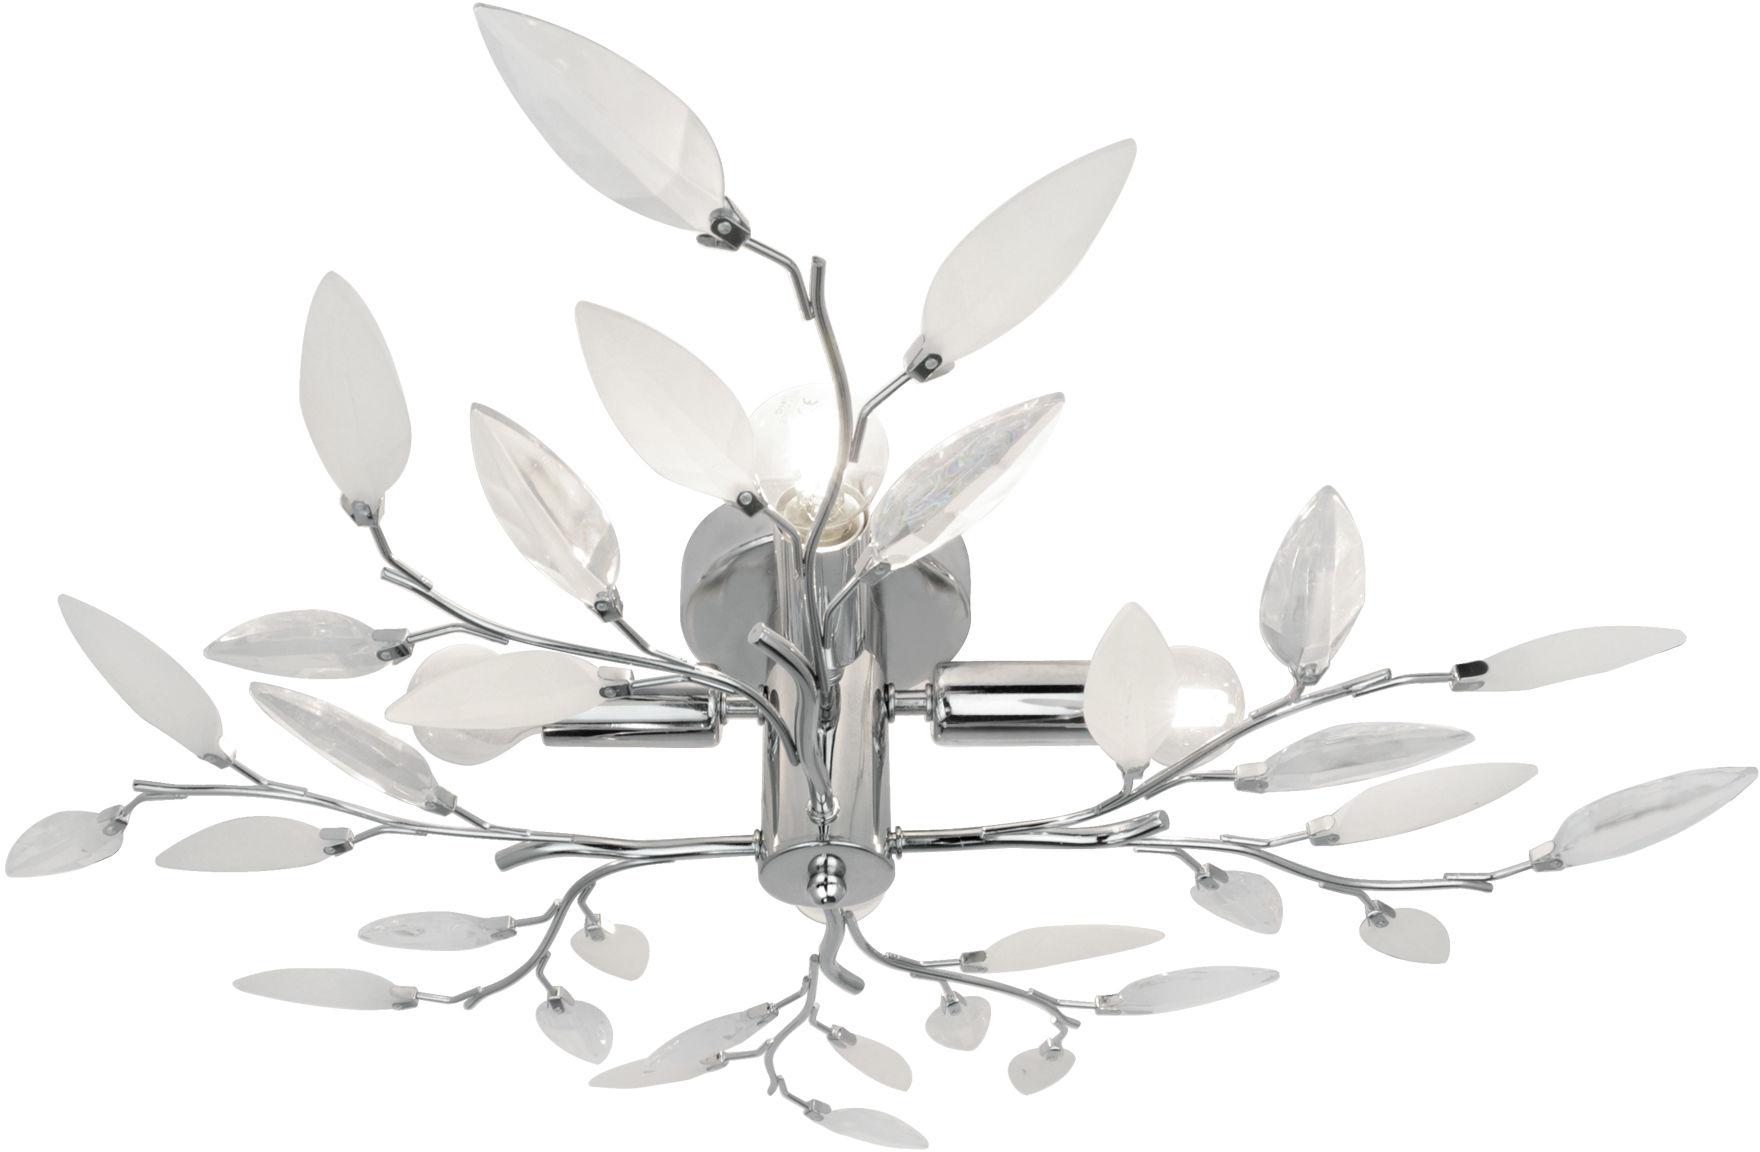 Zuma Line P749A LIA plafon lampa sufitowa chrom srebrny 4xE14 40W 61,5 cm